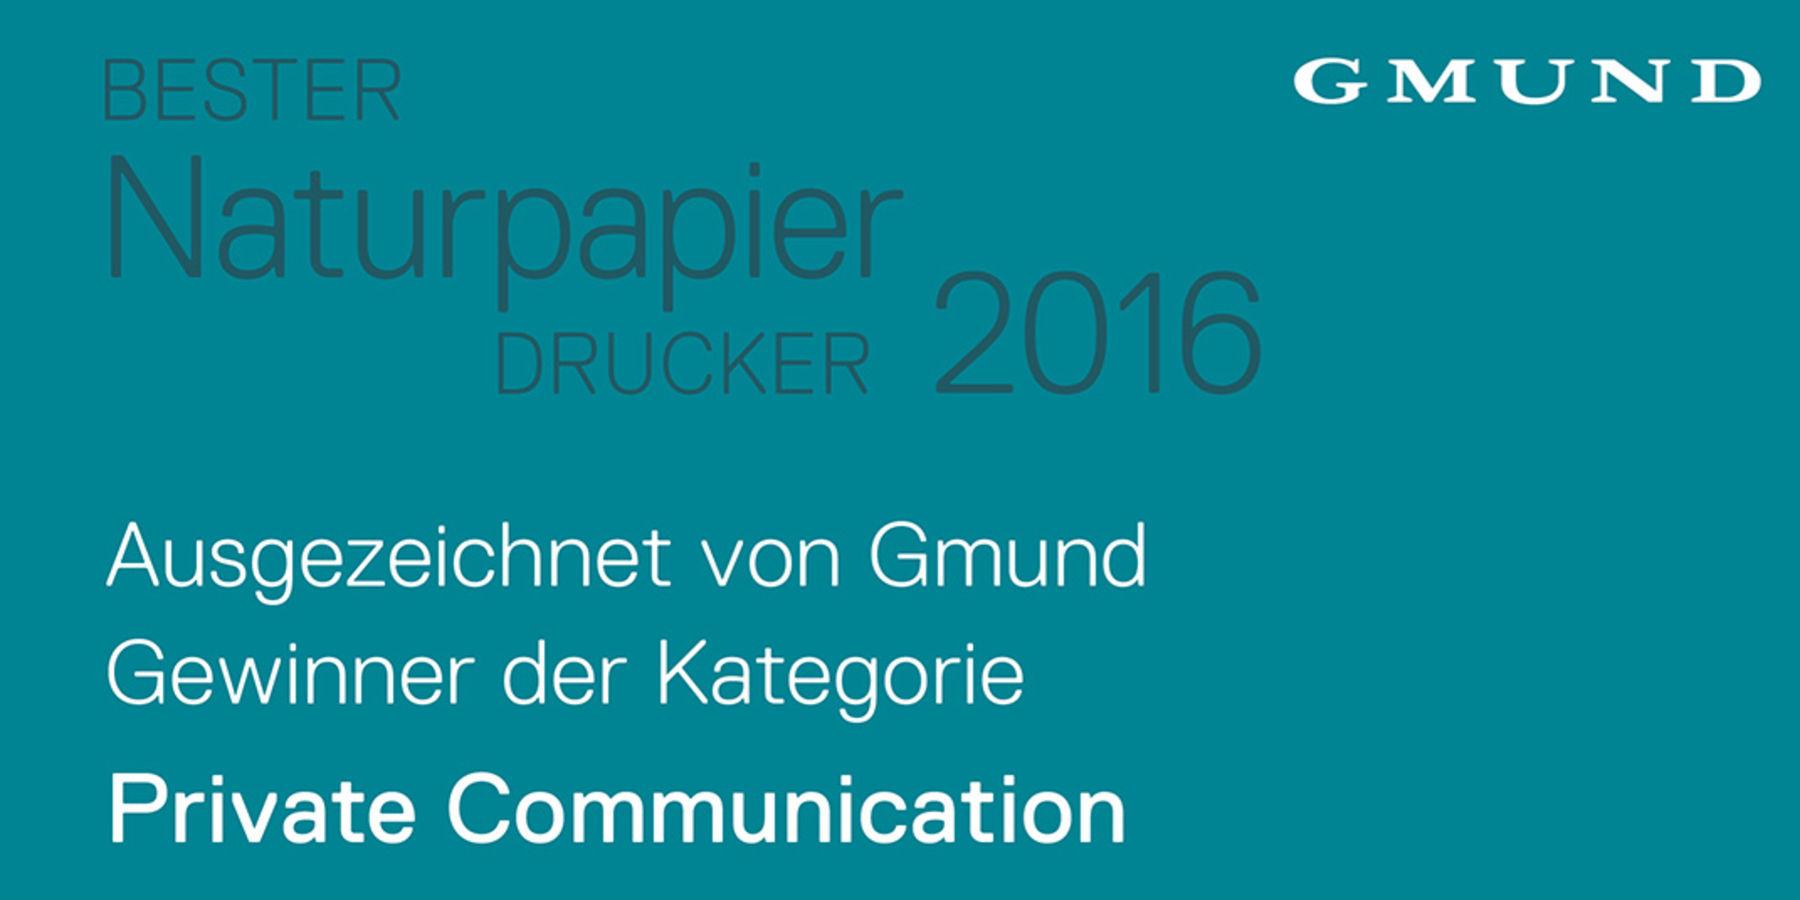 gmund_award/naturpapier